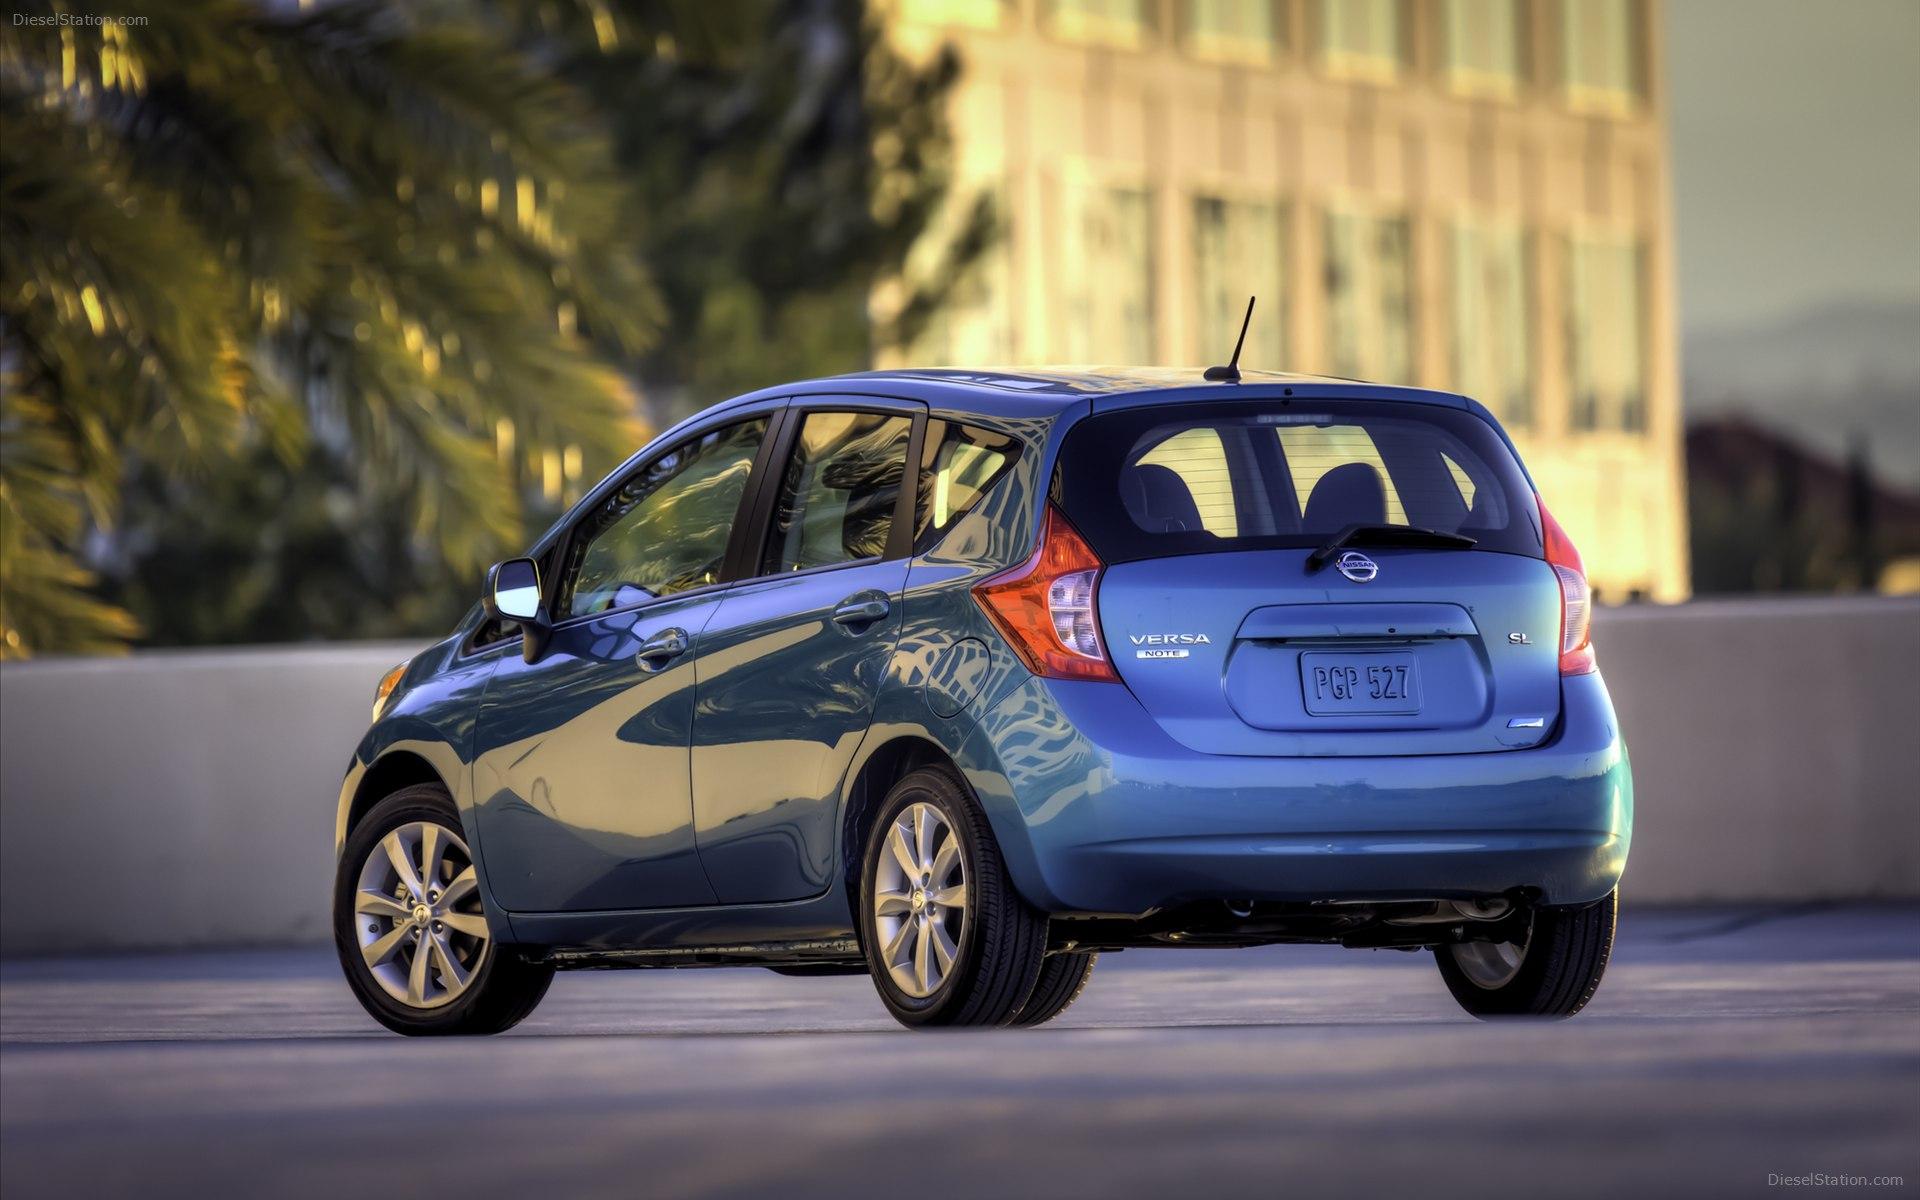 http://araba10.com/wp-content/uploads/2014/08/Nissan-Note.jpg